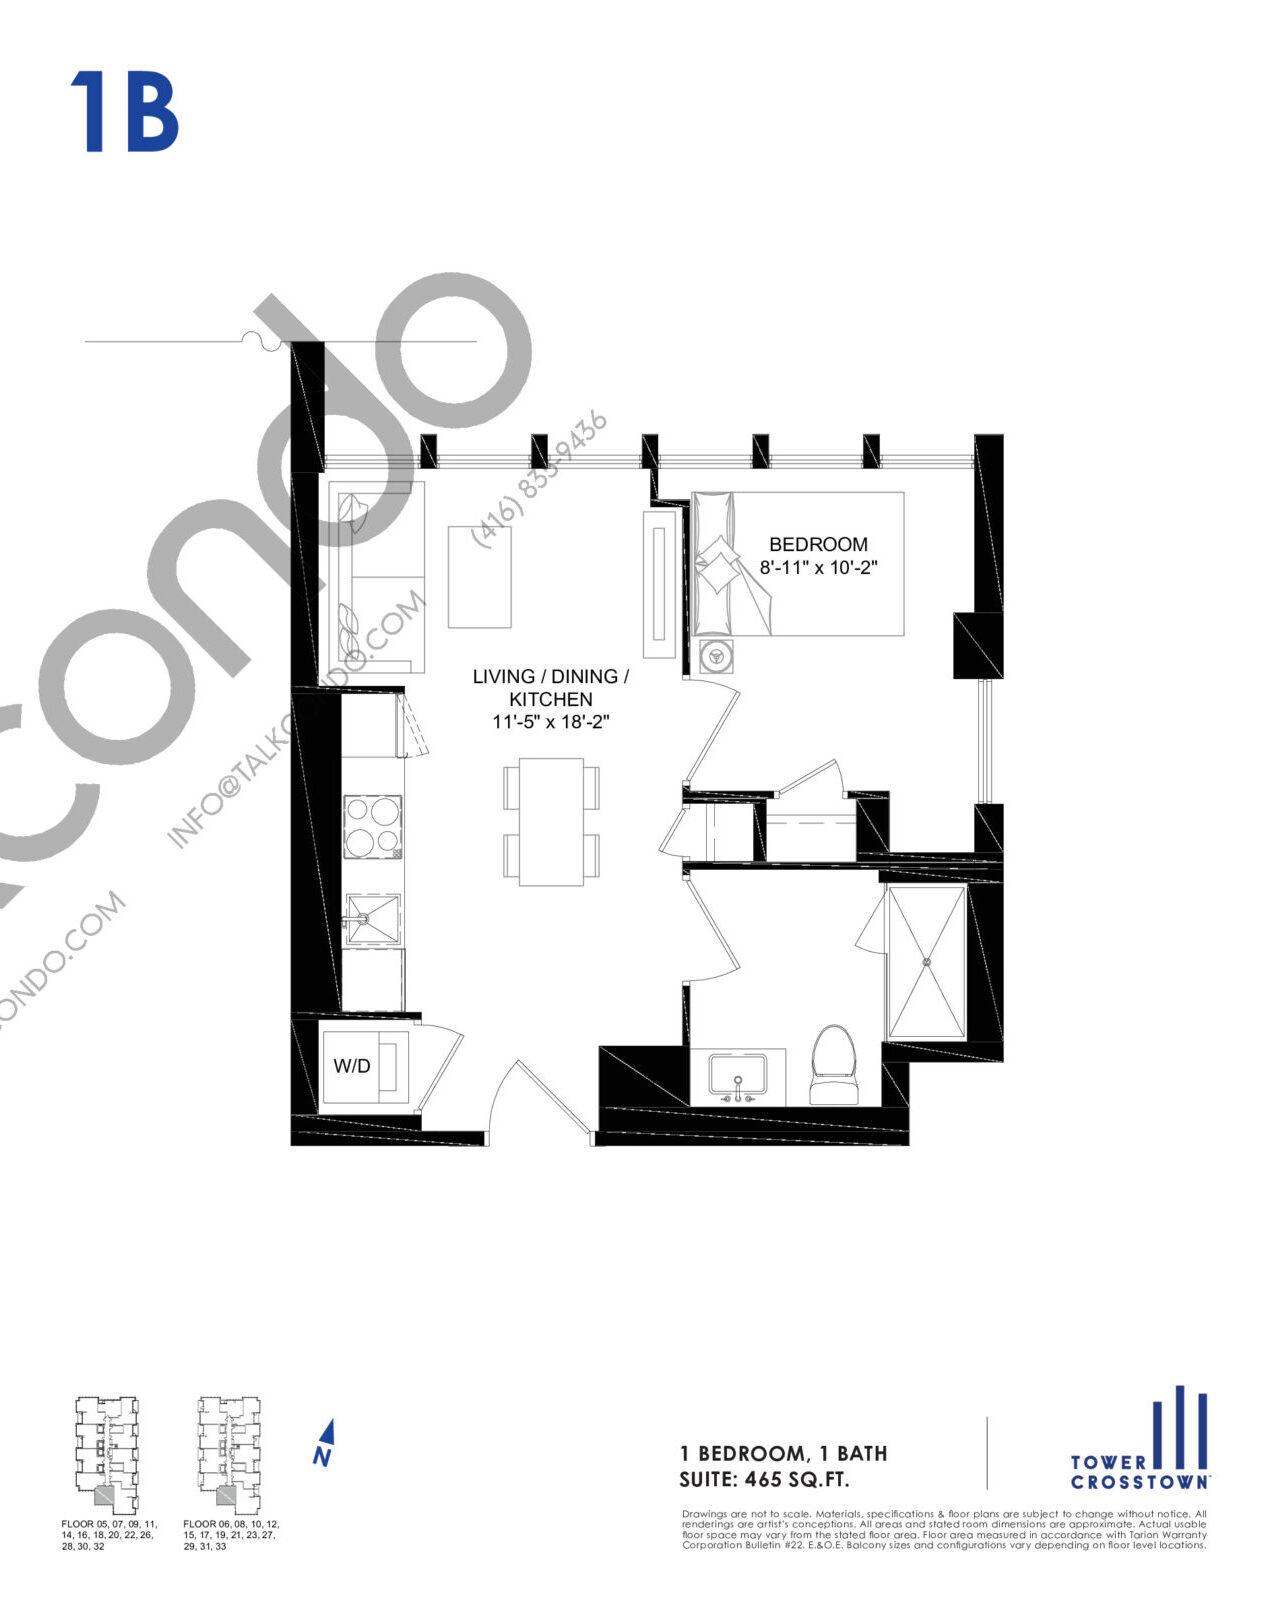 1B Floor Plan at Crosstown Tower 3 Condos - 465 sq.ft